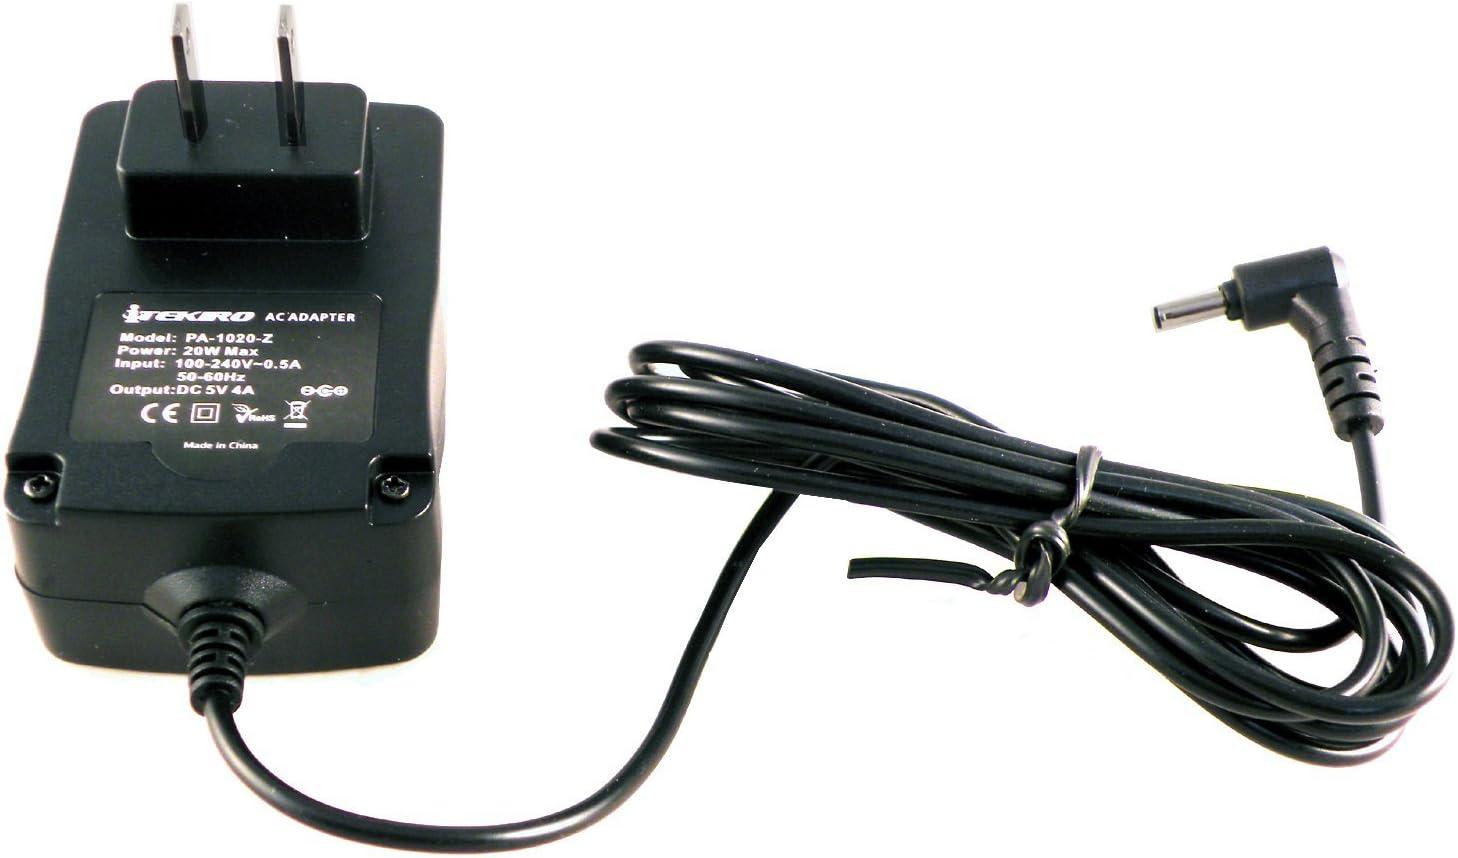 iTEKIRO 5V 4A 20W 6.5 Ft Extra Long Cord AC Wall Charger for Lenovo Ideapad 100S 11.6